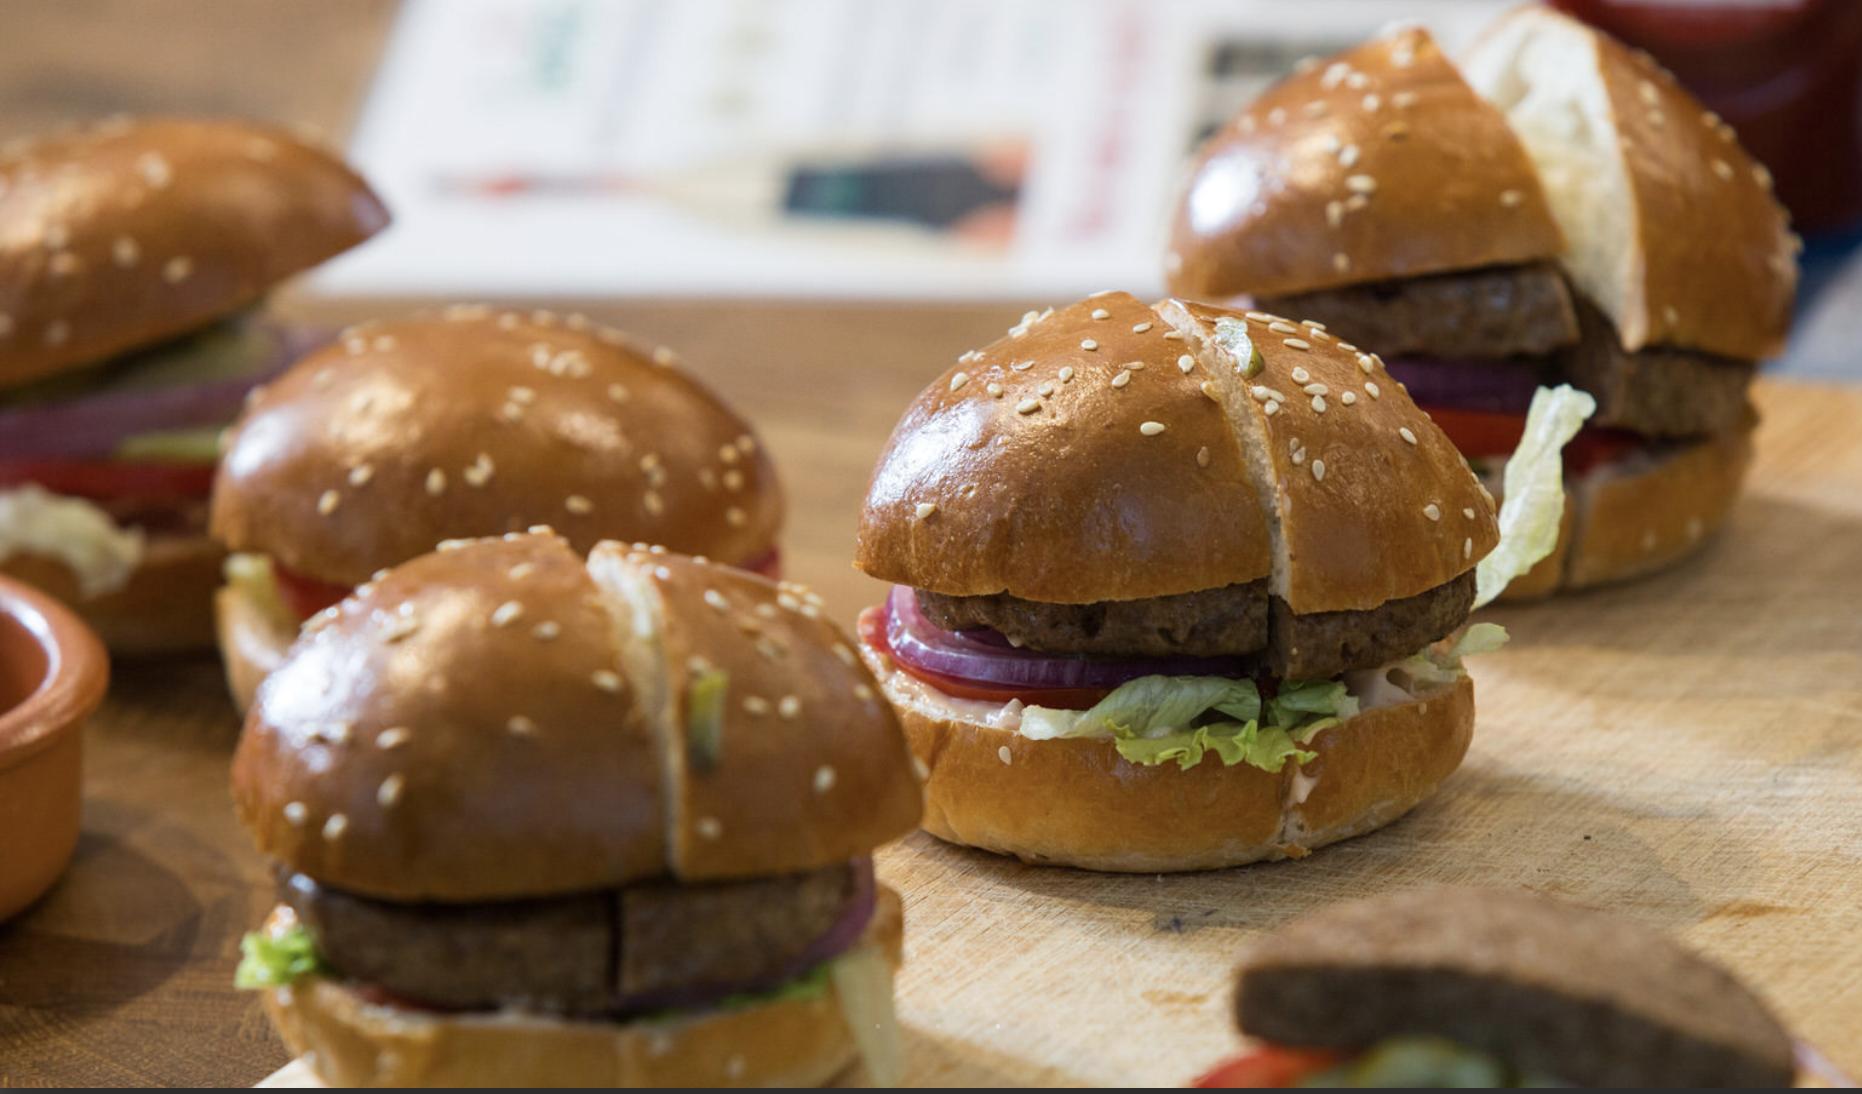 SavorEat's 3D printed plant-based burgers. Photo via SavorEat.